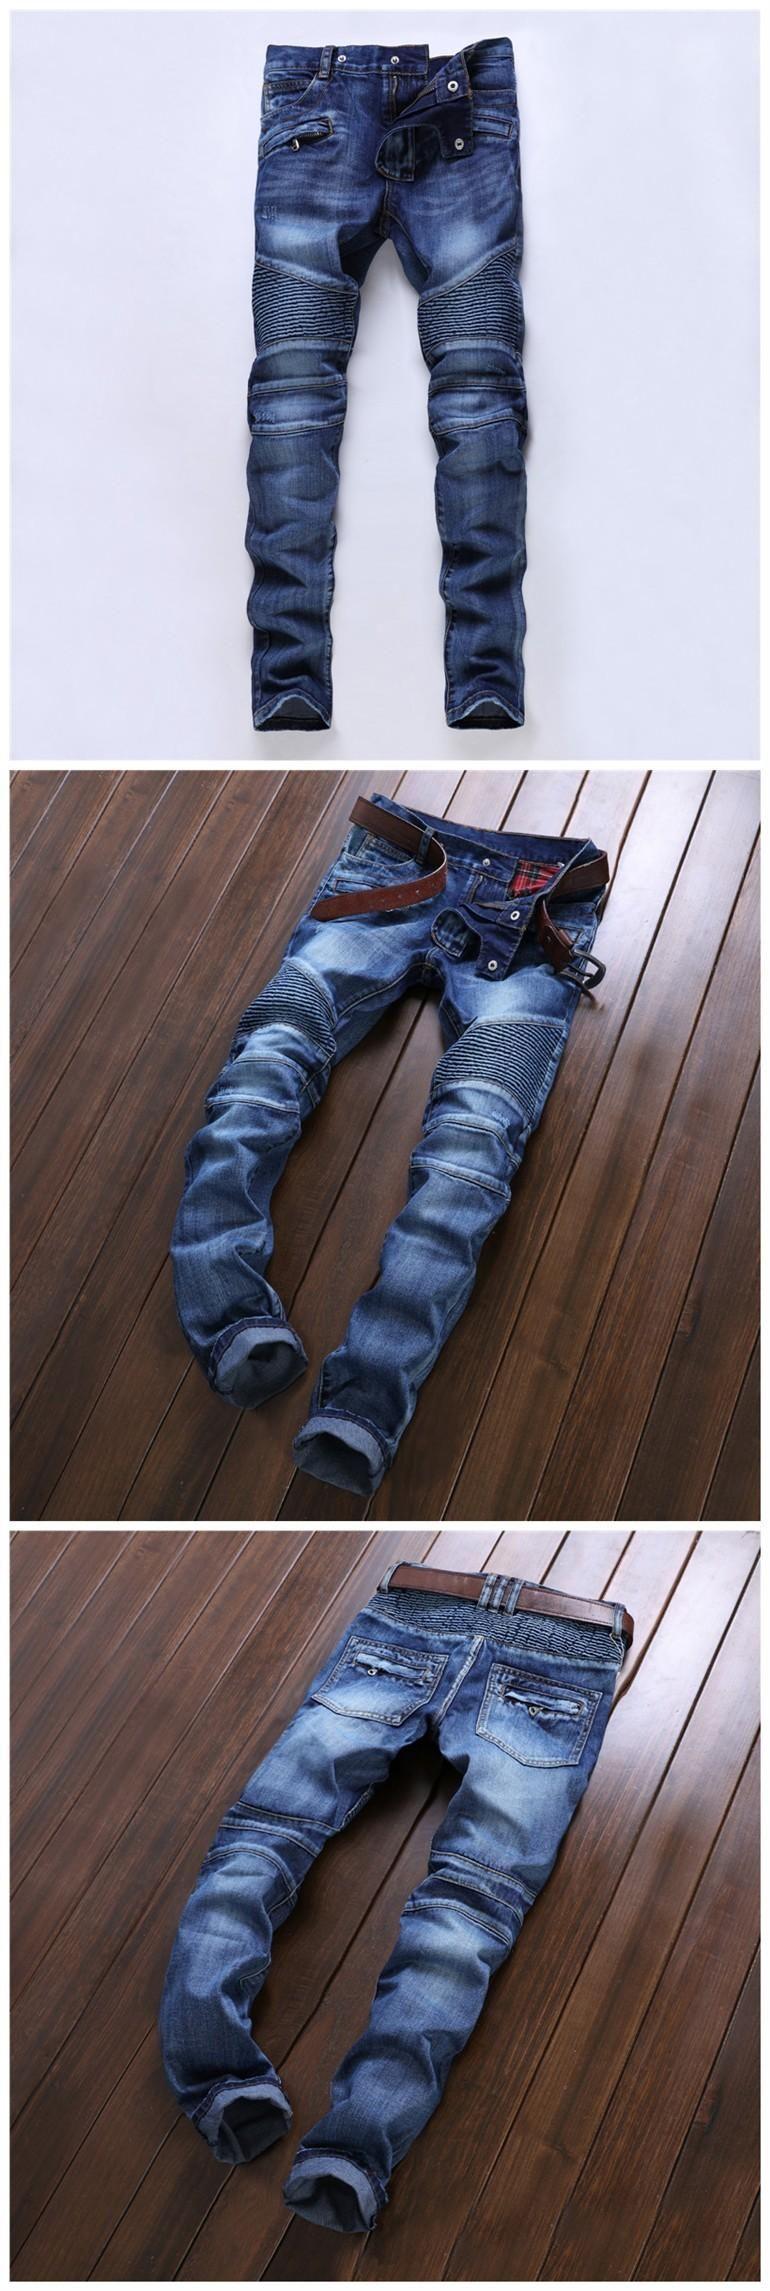 2046ddaca5f83c 2016 Balmain Jeans Men 2016 Hot Mens Designer Jeans Famous Brand Balmain Jeans  Men Distressed Jeans Ripped Denim Jn01 From Top_trading, $53.27 | Dhgate.Com